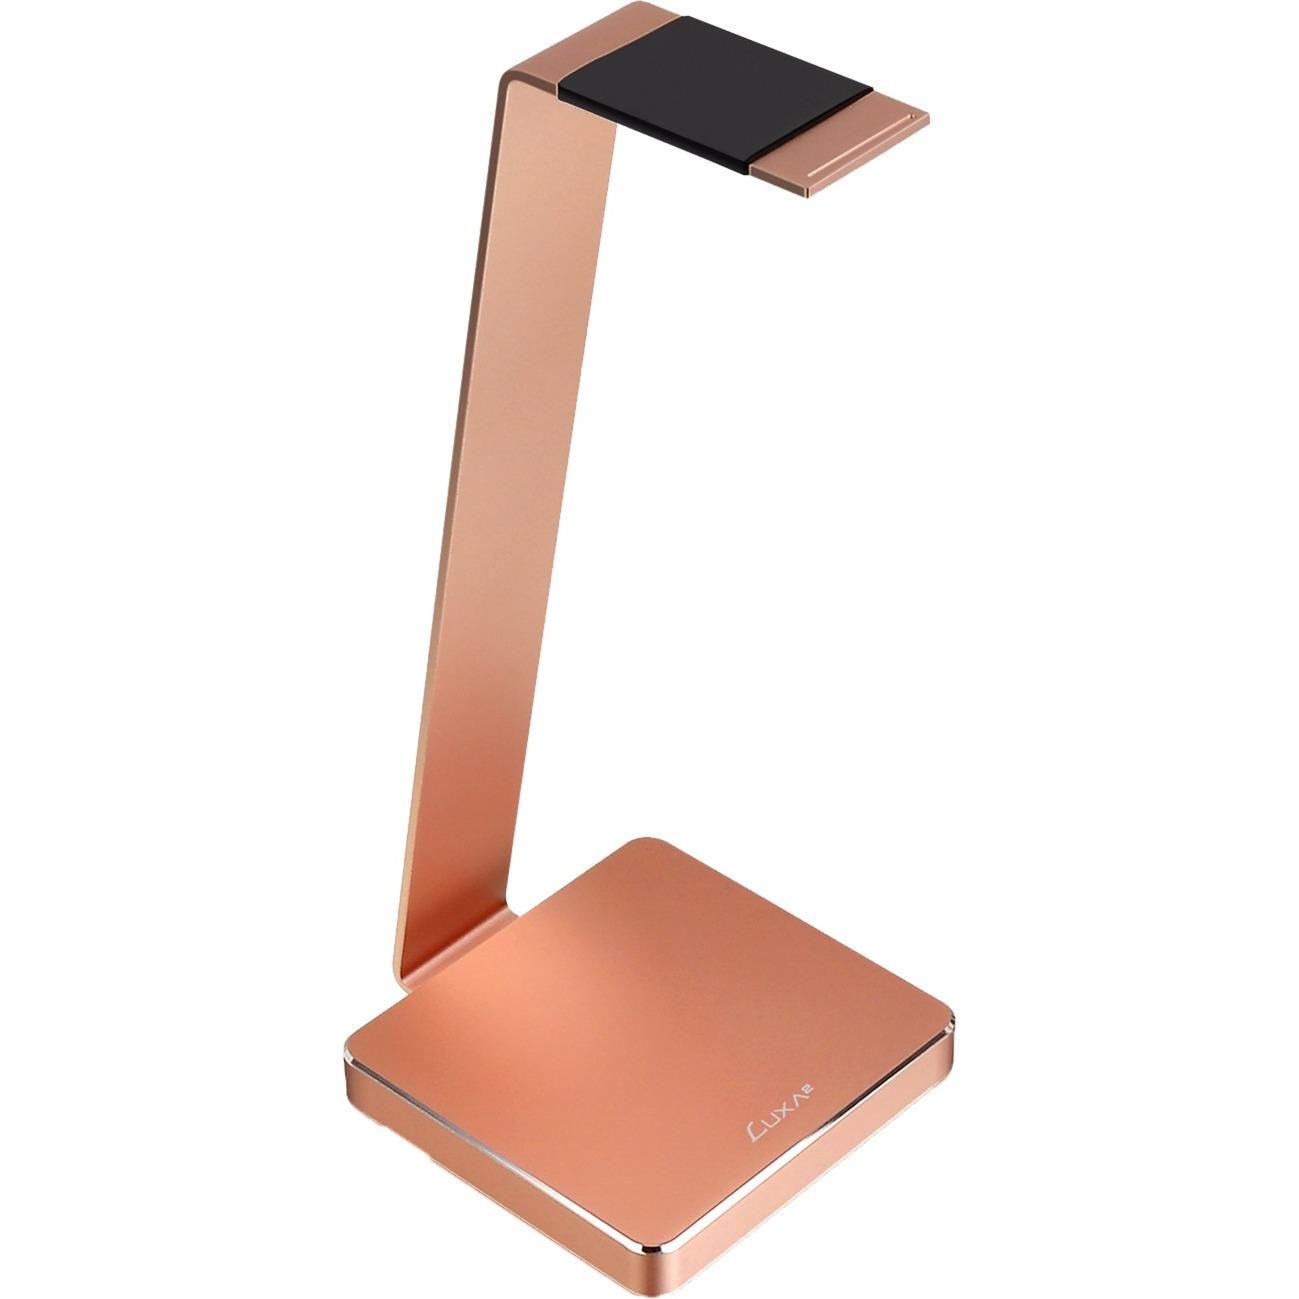 HO-HDP-ALE1RG-00 auricular / audífono accesorio Headphone holder, Soporte